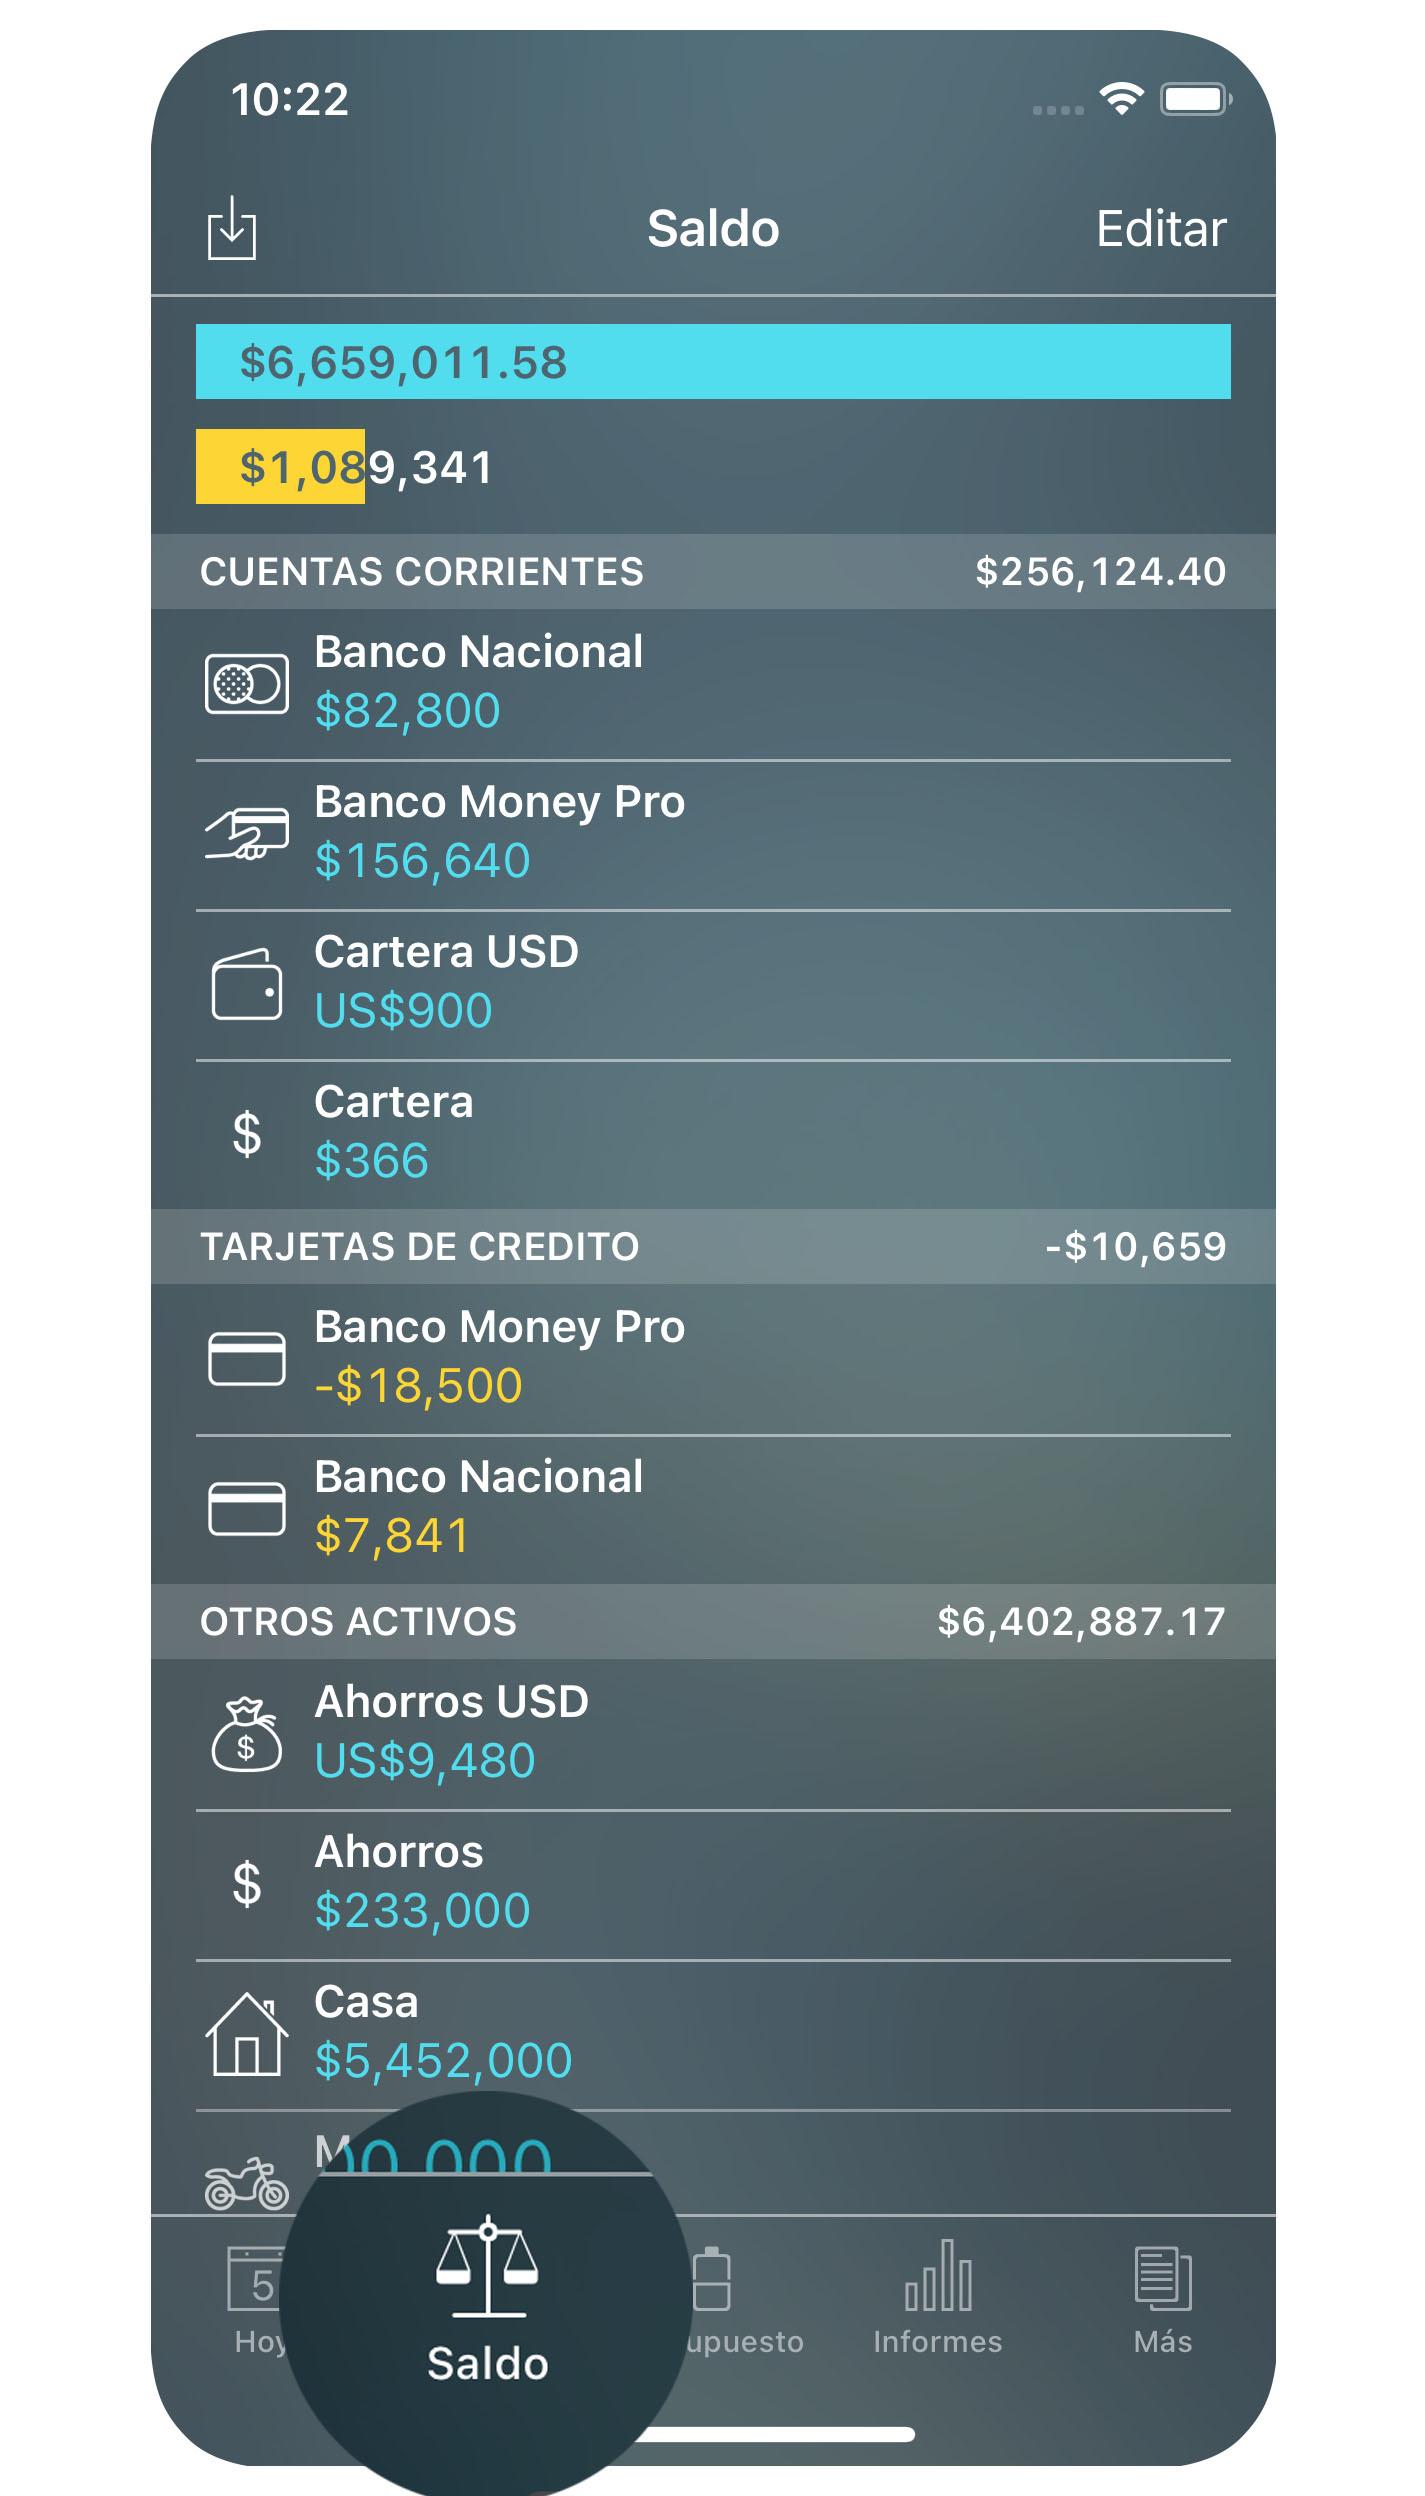 60ef23079 Money Pro - Cuentas (Saldo) - iPhone